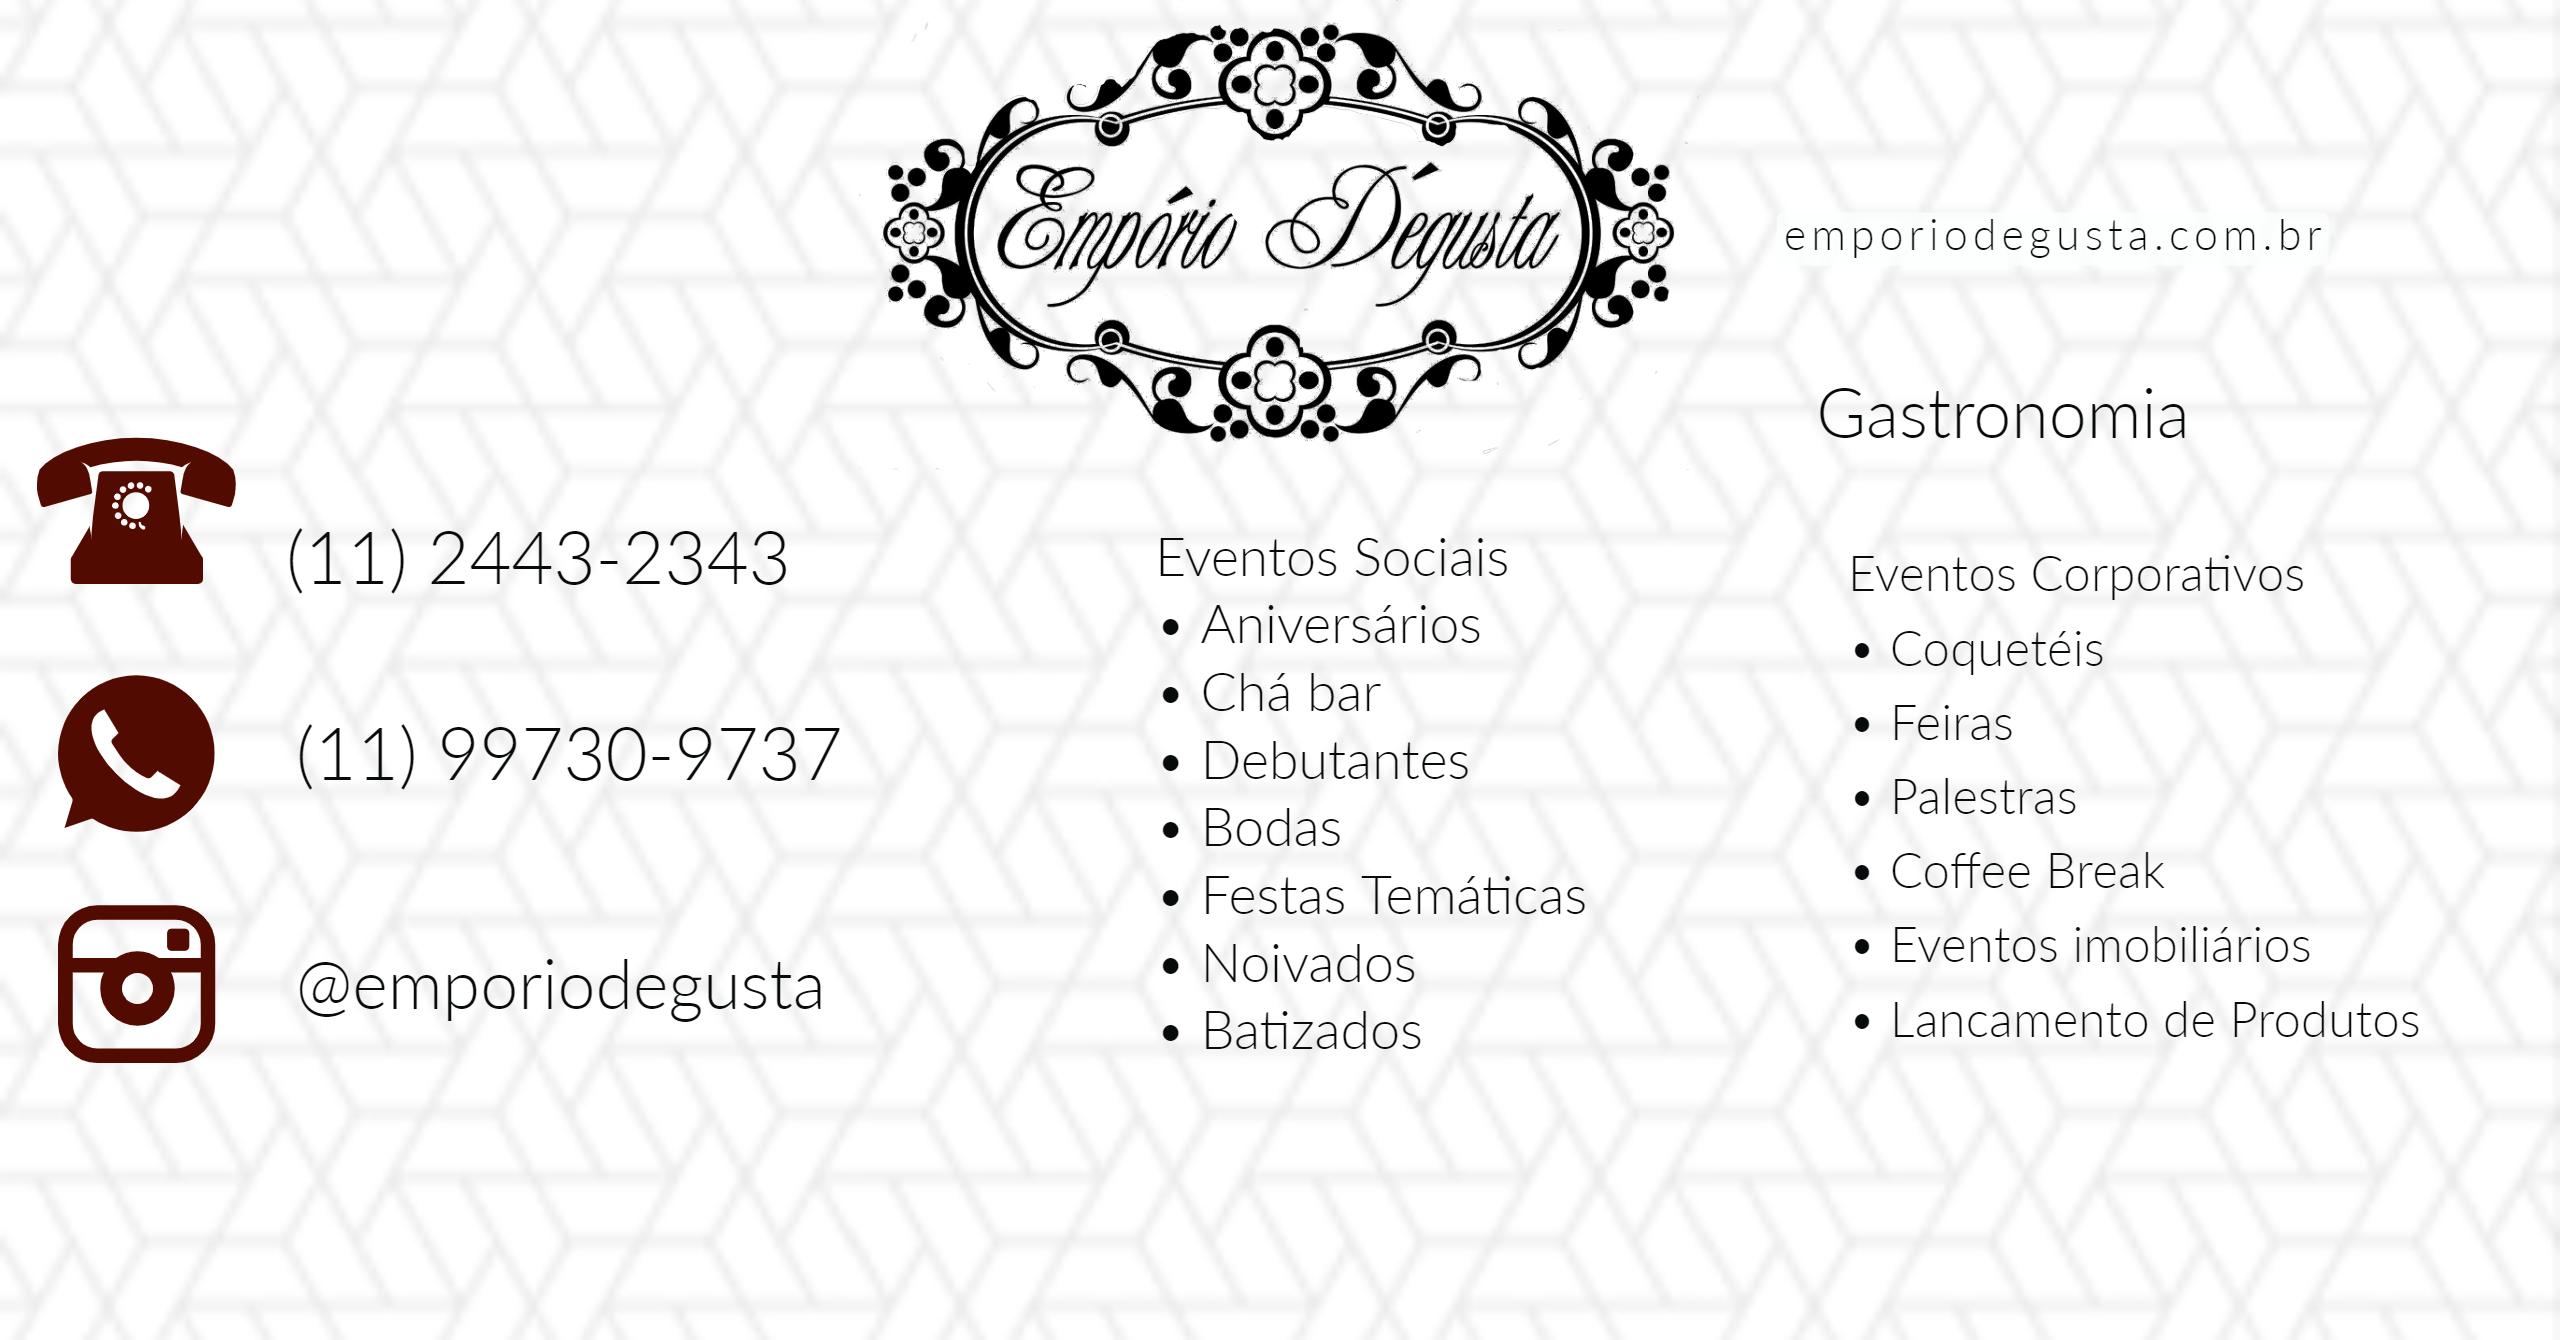 Portfólio de serviços Emporio Degusta Guarulhos